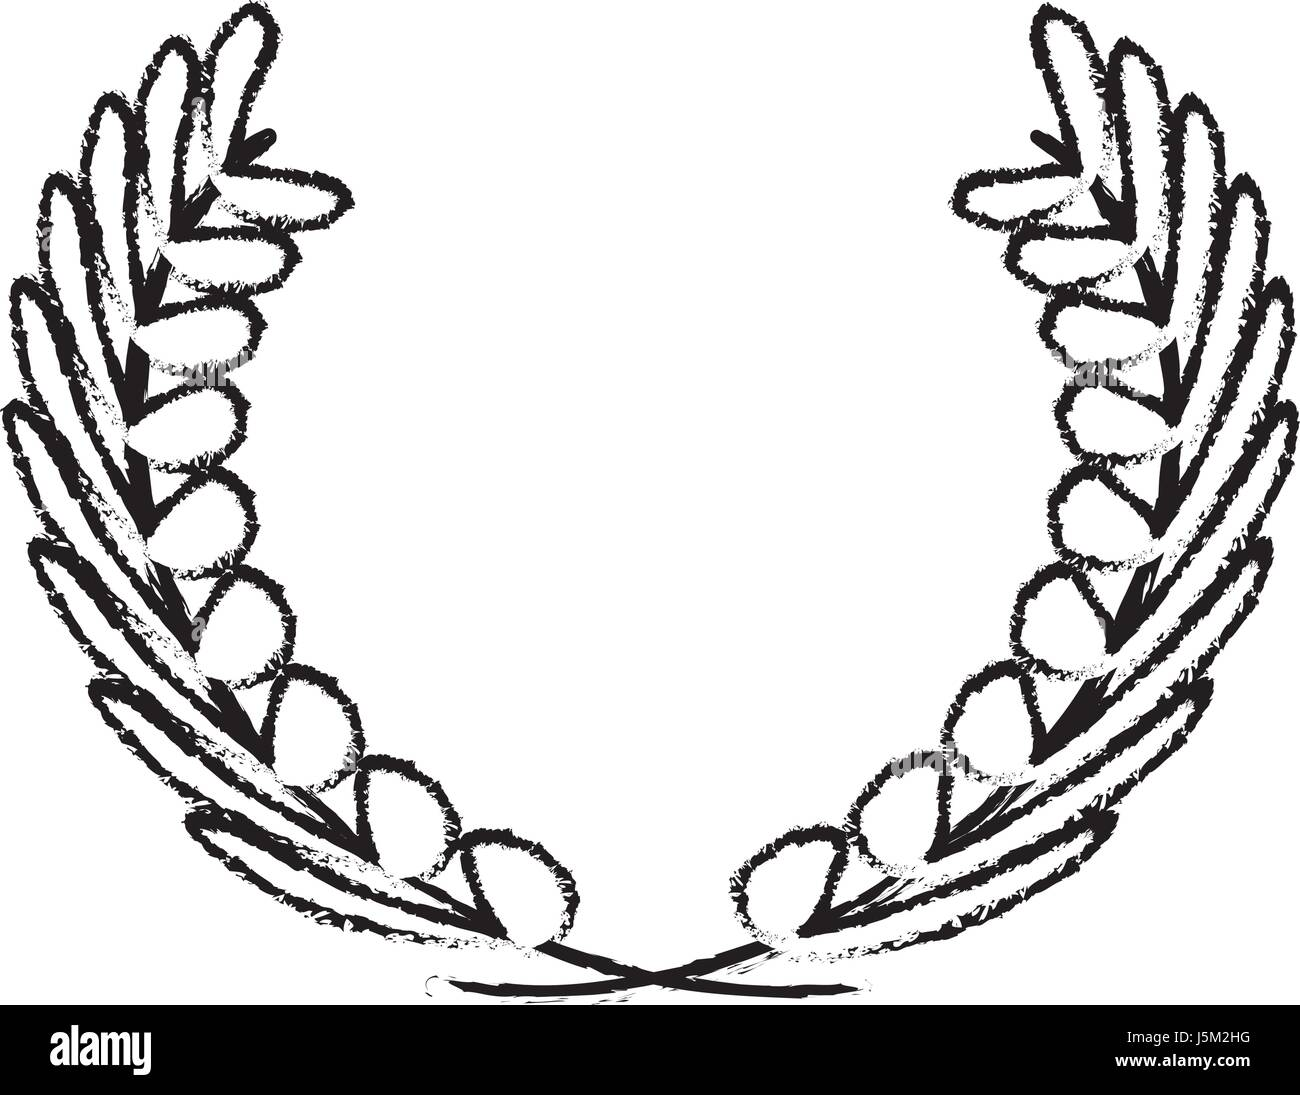 wreath of leaves icon stock vector art u0026 illustration vector